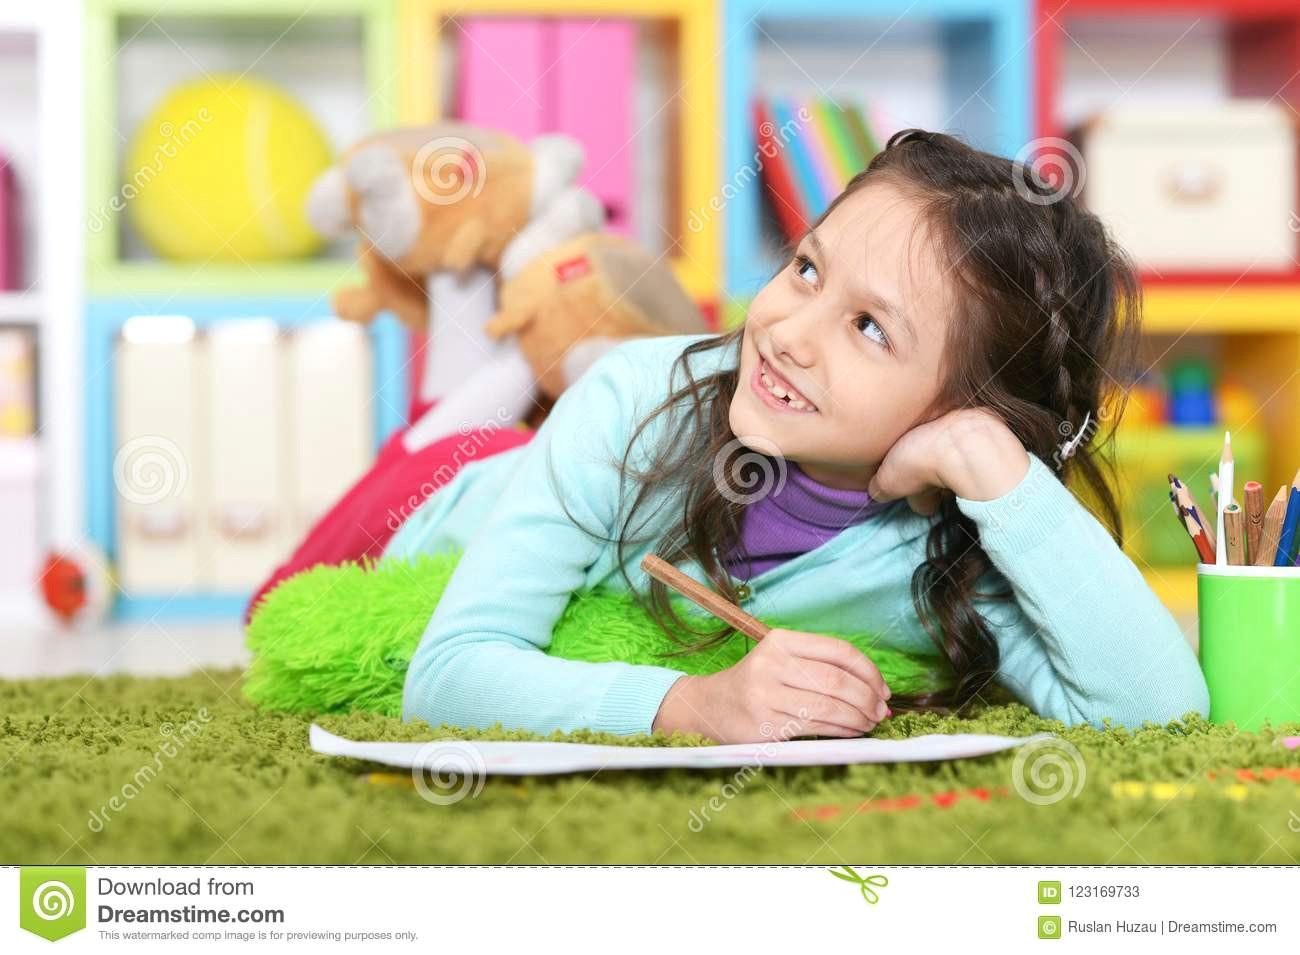 cute little girl drawing lying cute little girl drawing lying floor green carpet home 123169733 jpg